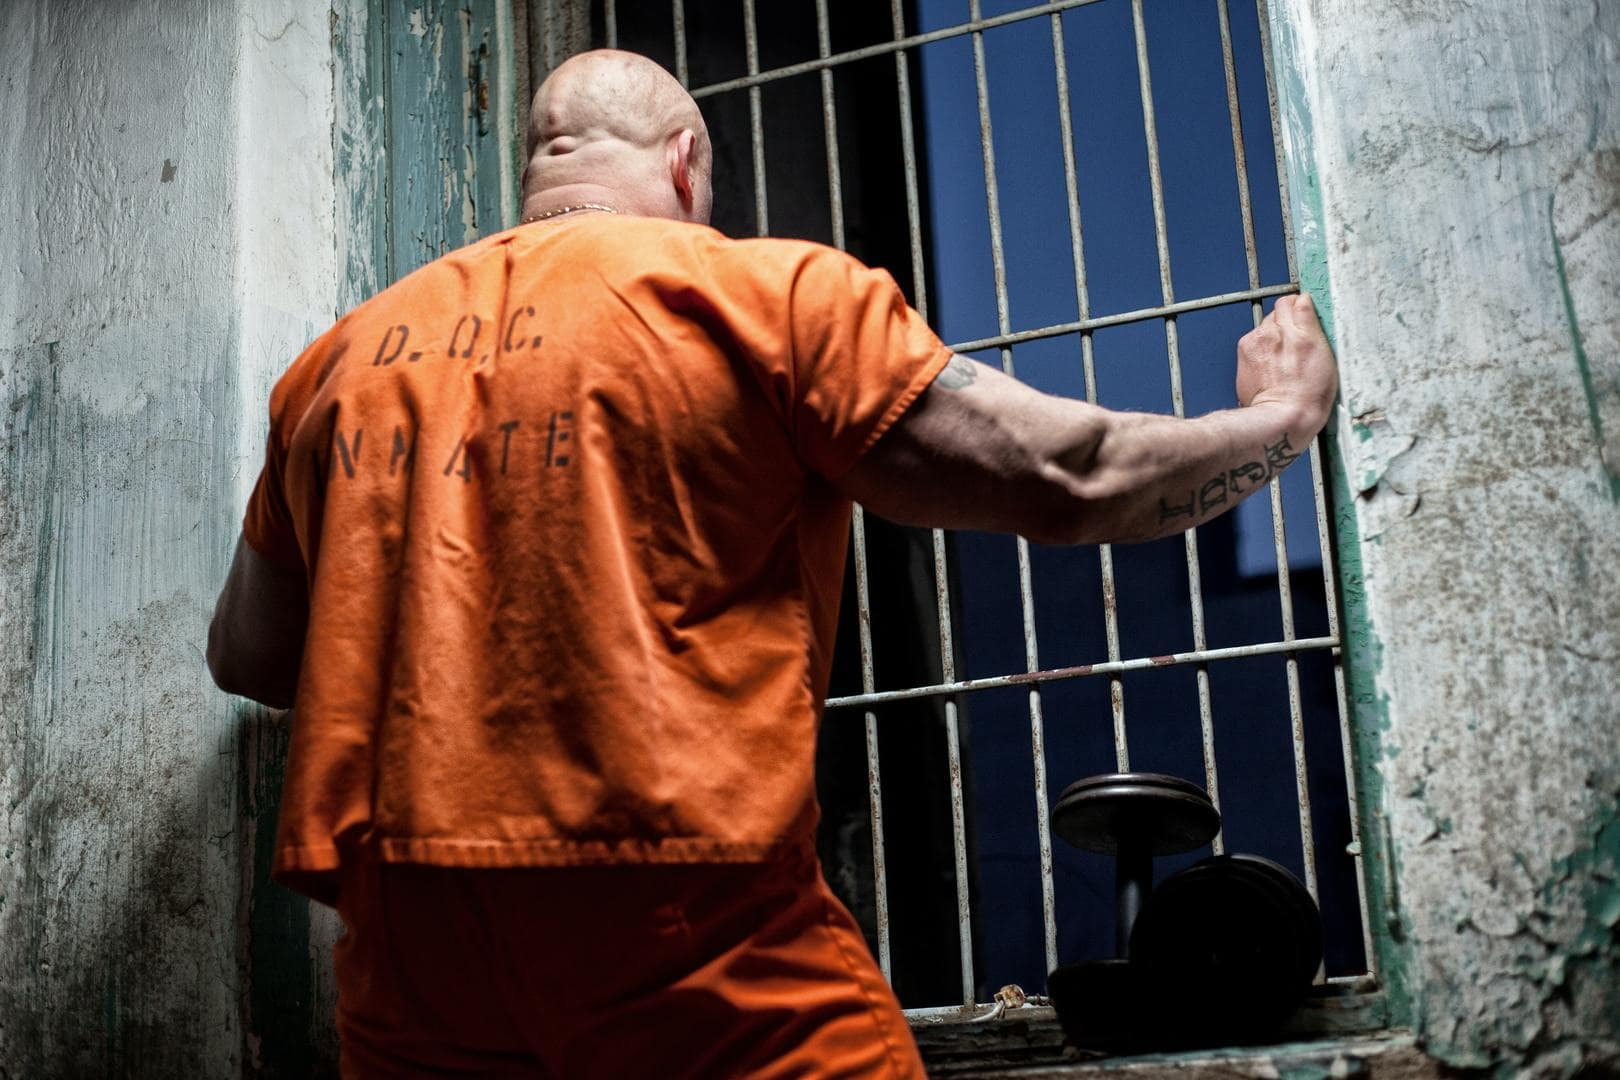 Prison reform and restorative justice